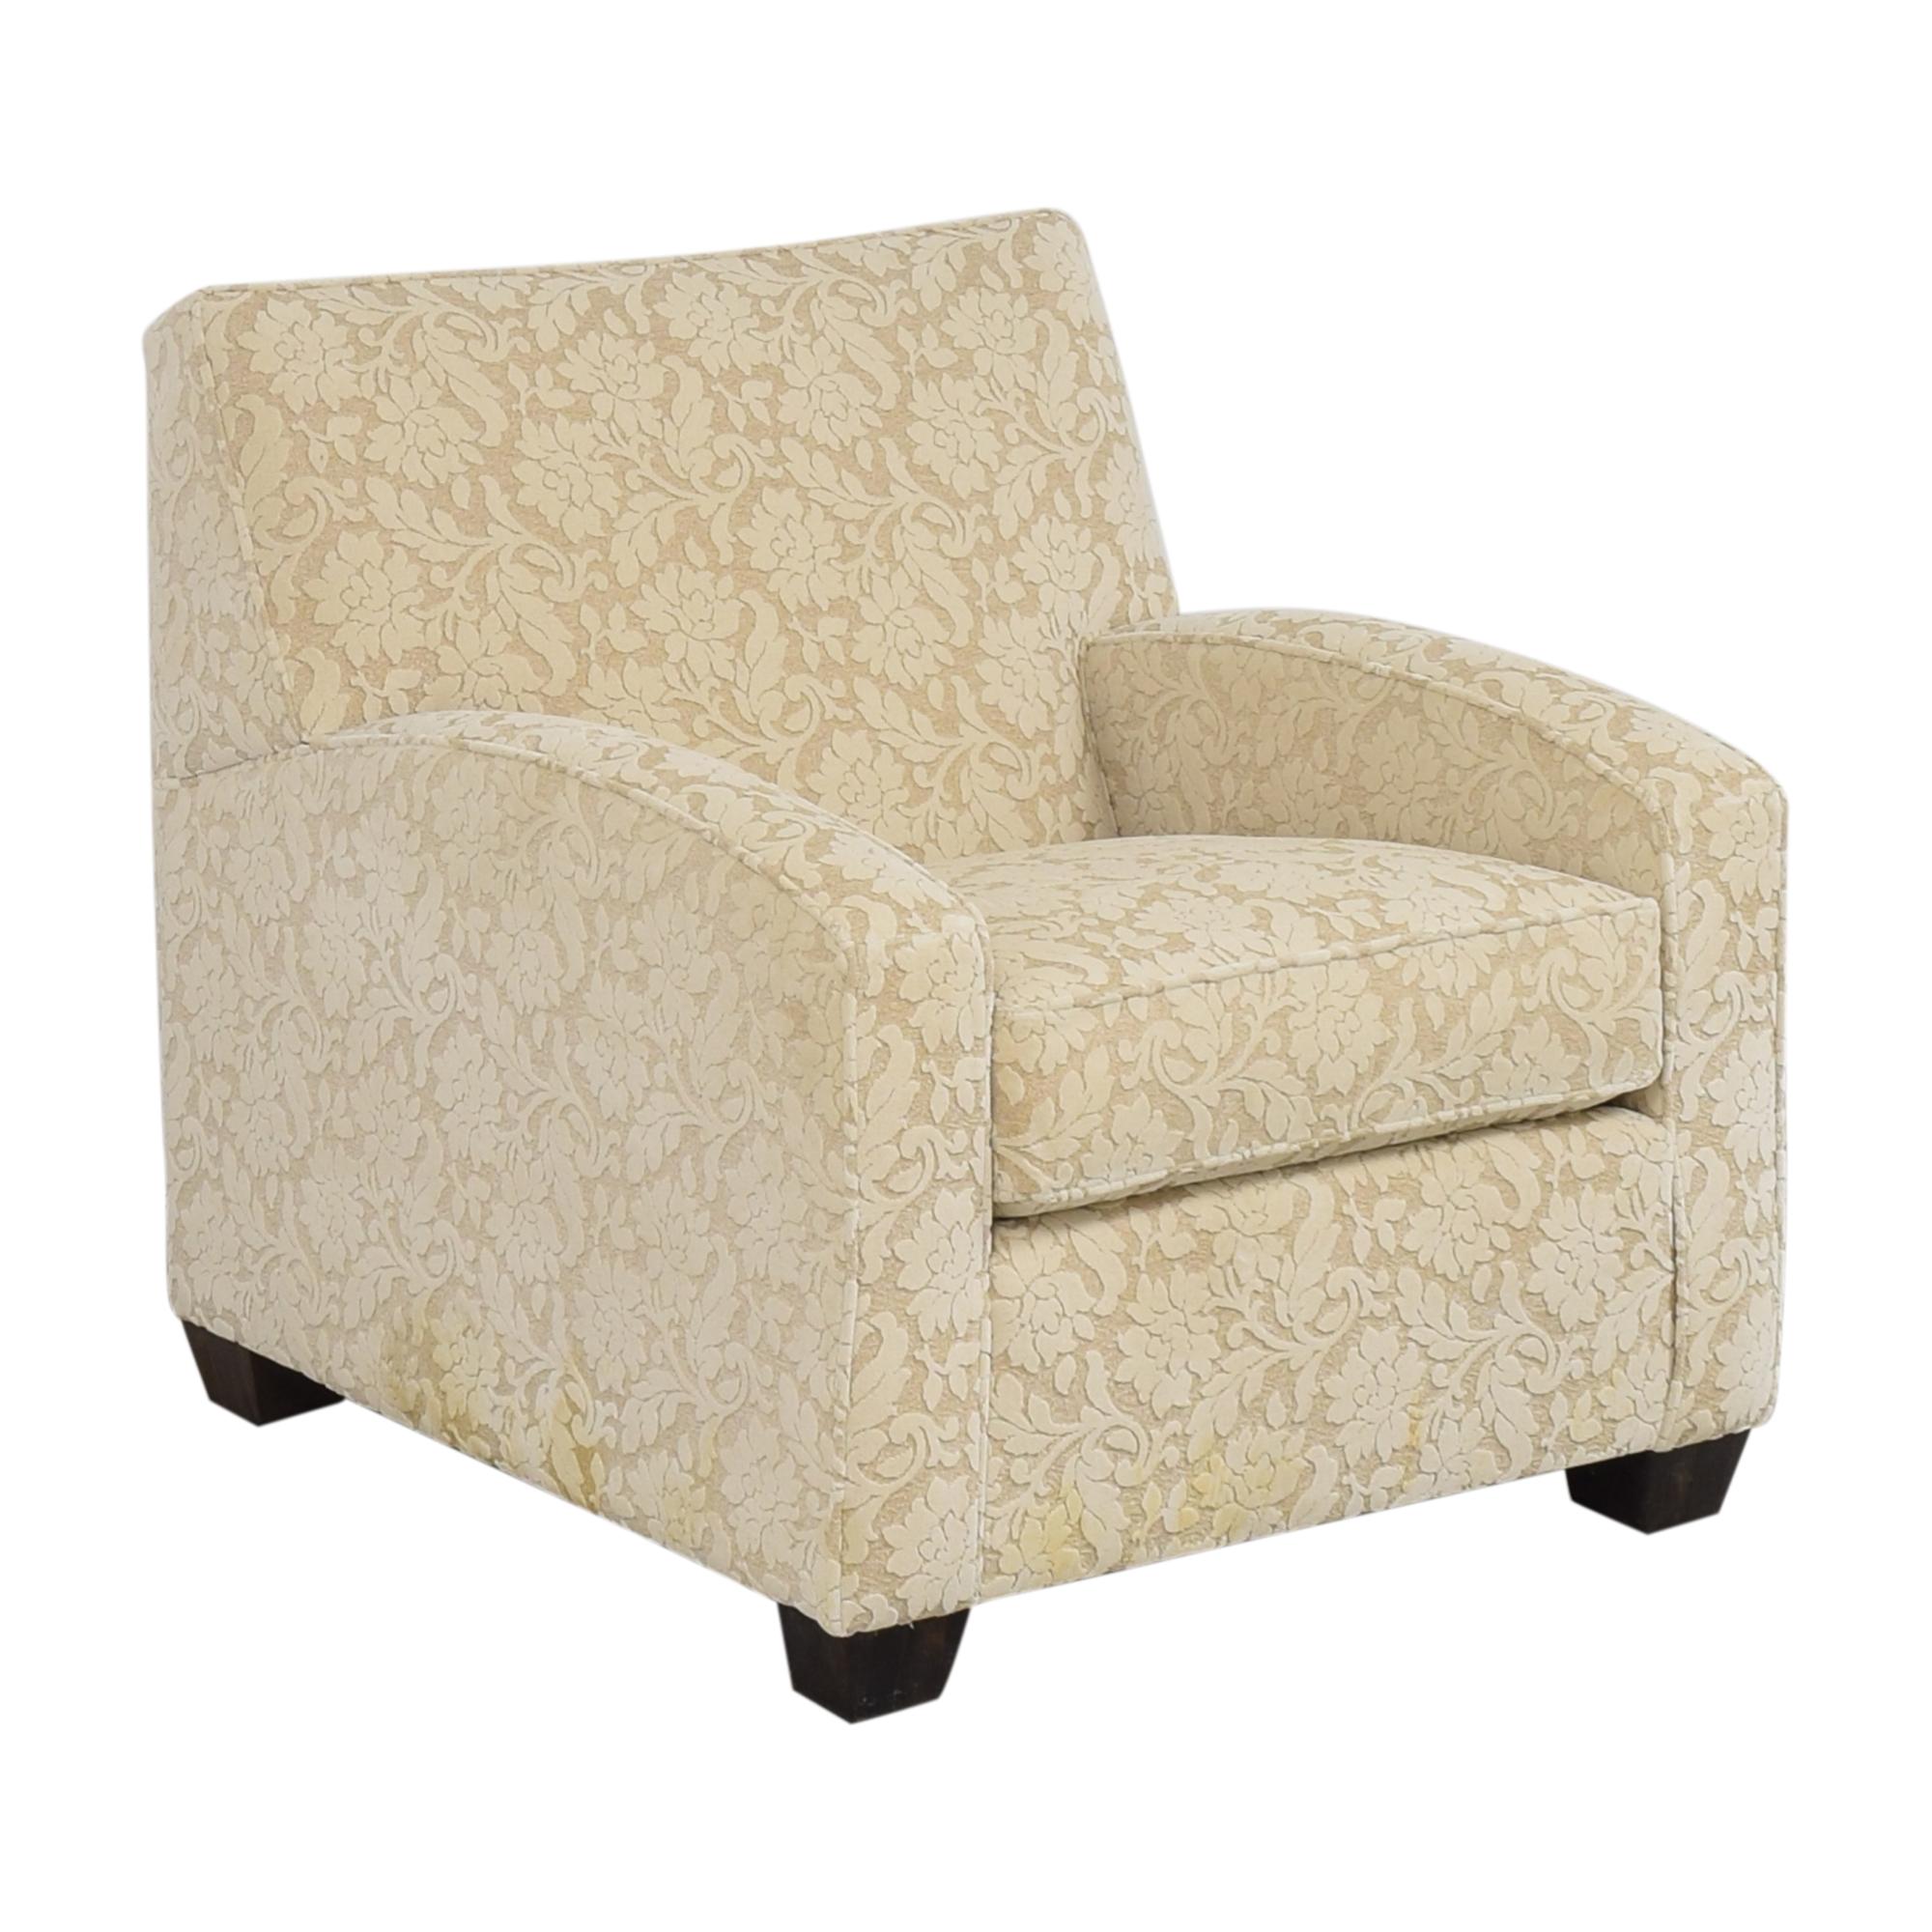 Ethan Allen Arc Chair / Accent Chairs